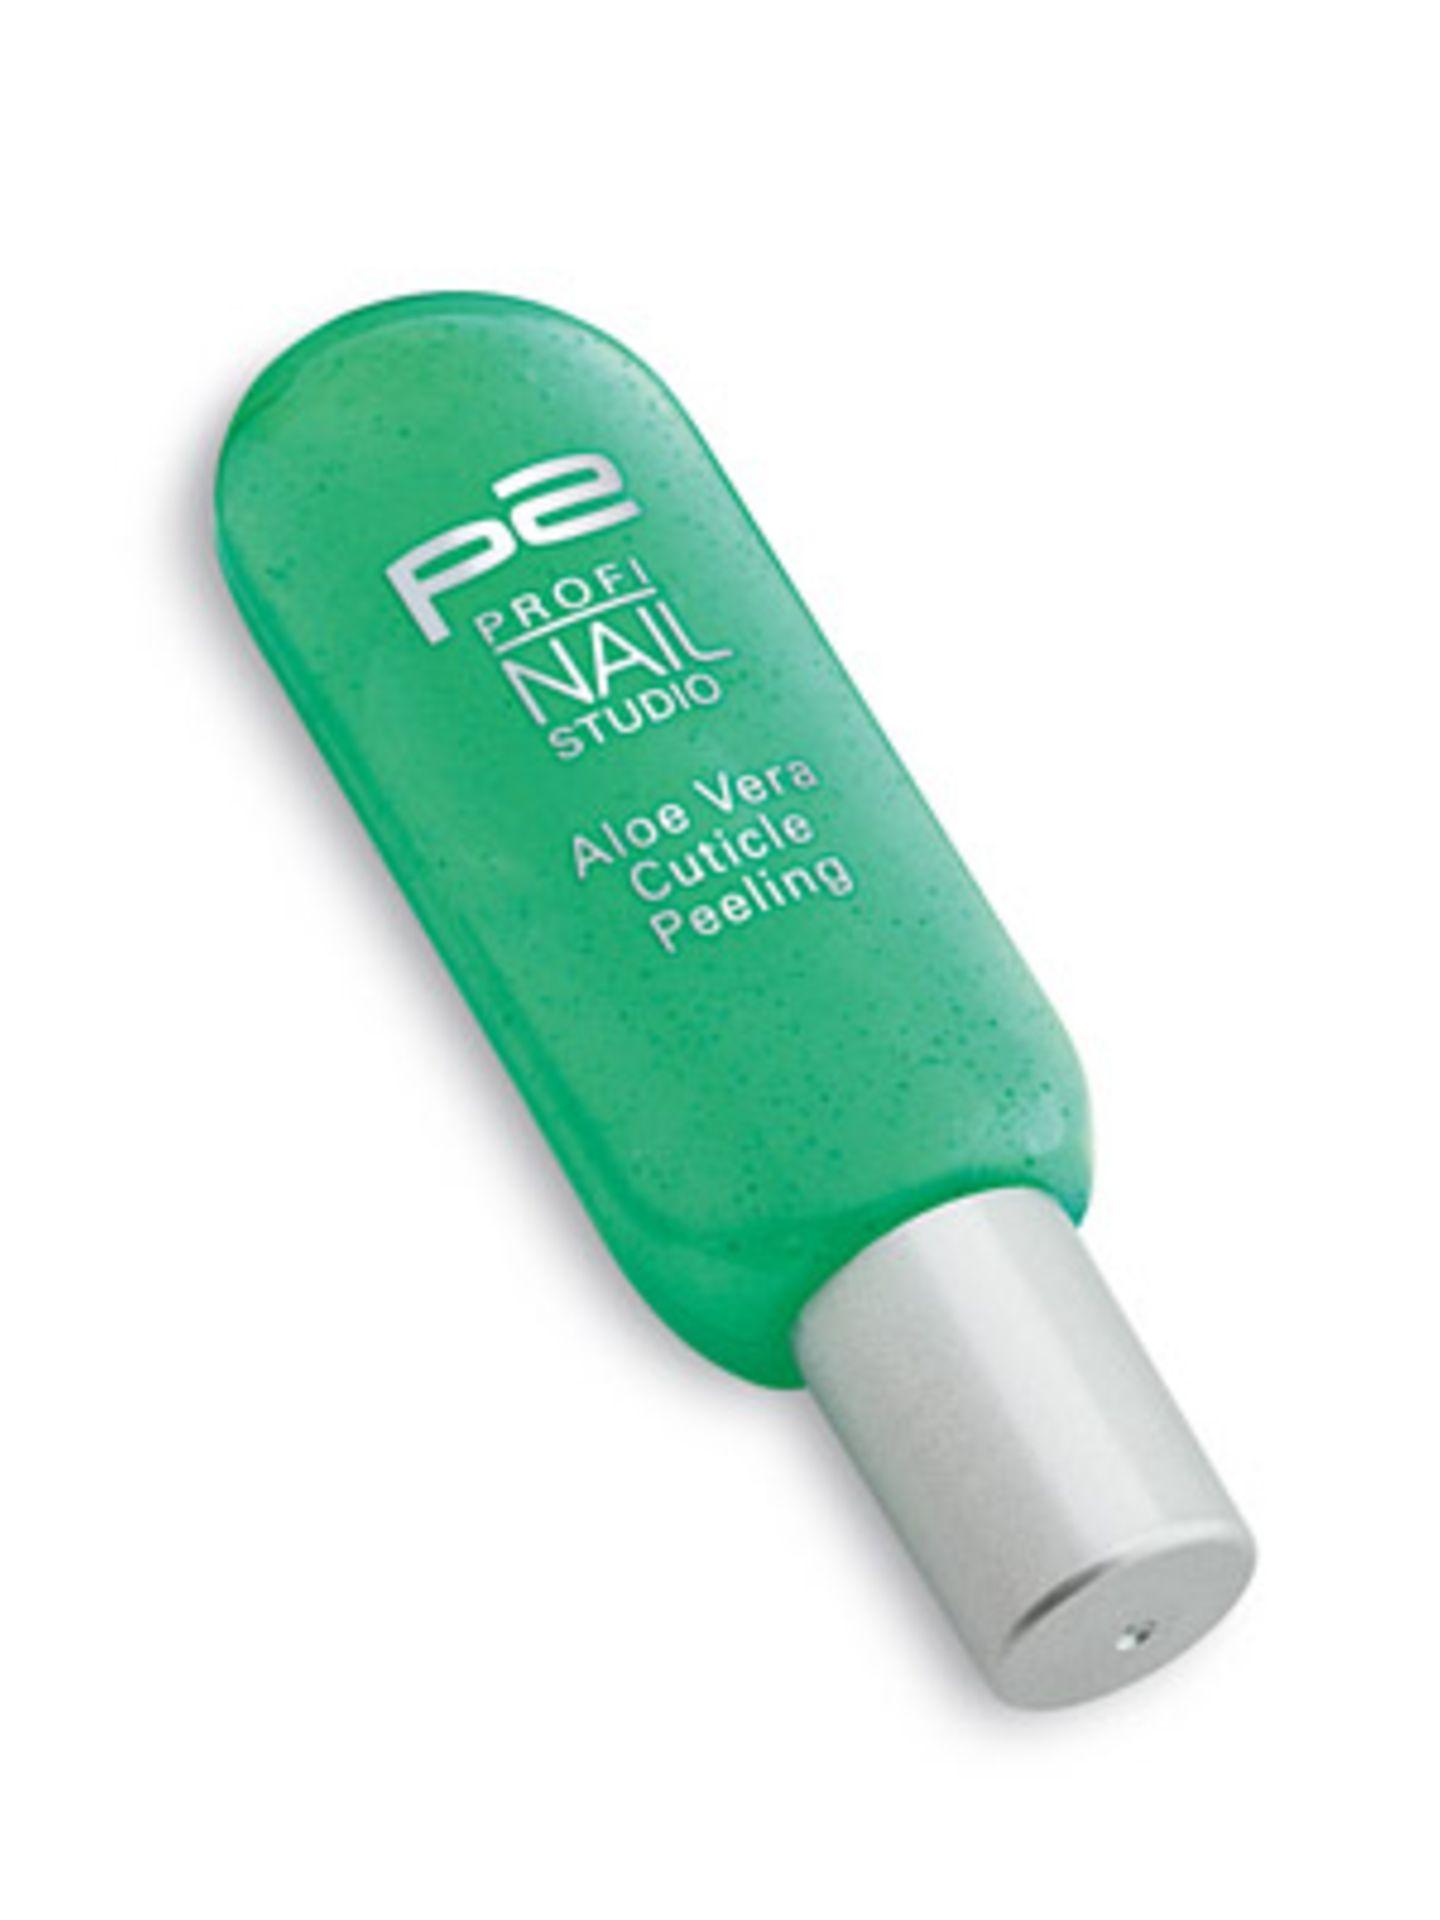 Nagelhaut-Peeling mit Aloe Vera von P2, um 2,50 Euro.